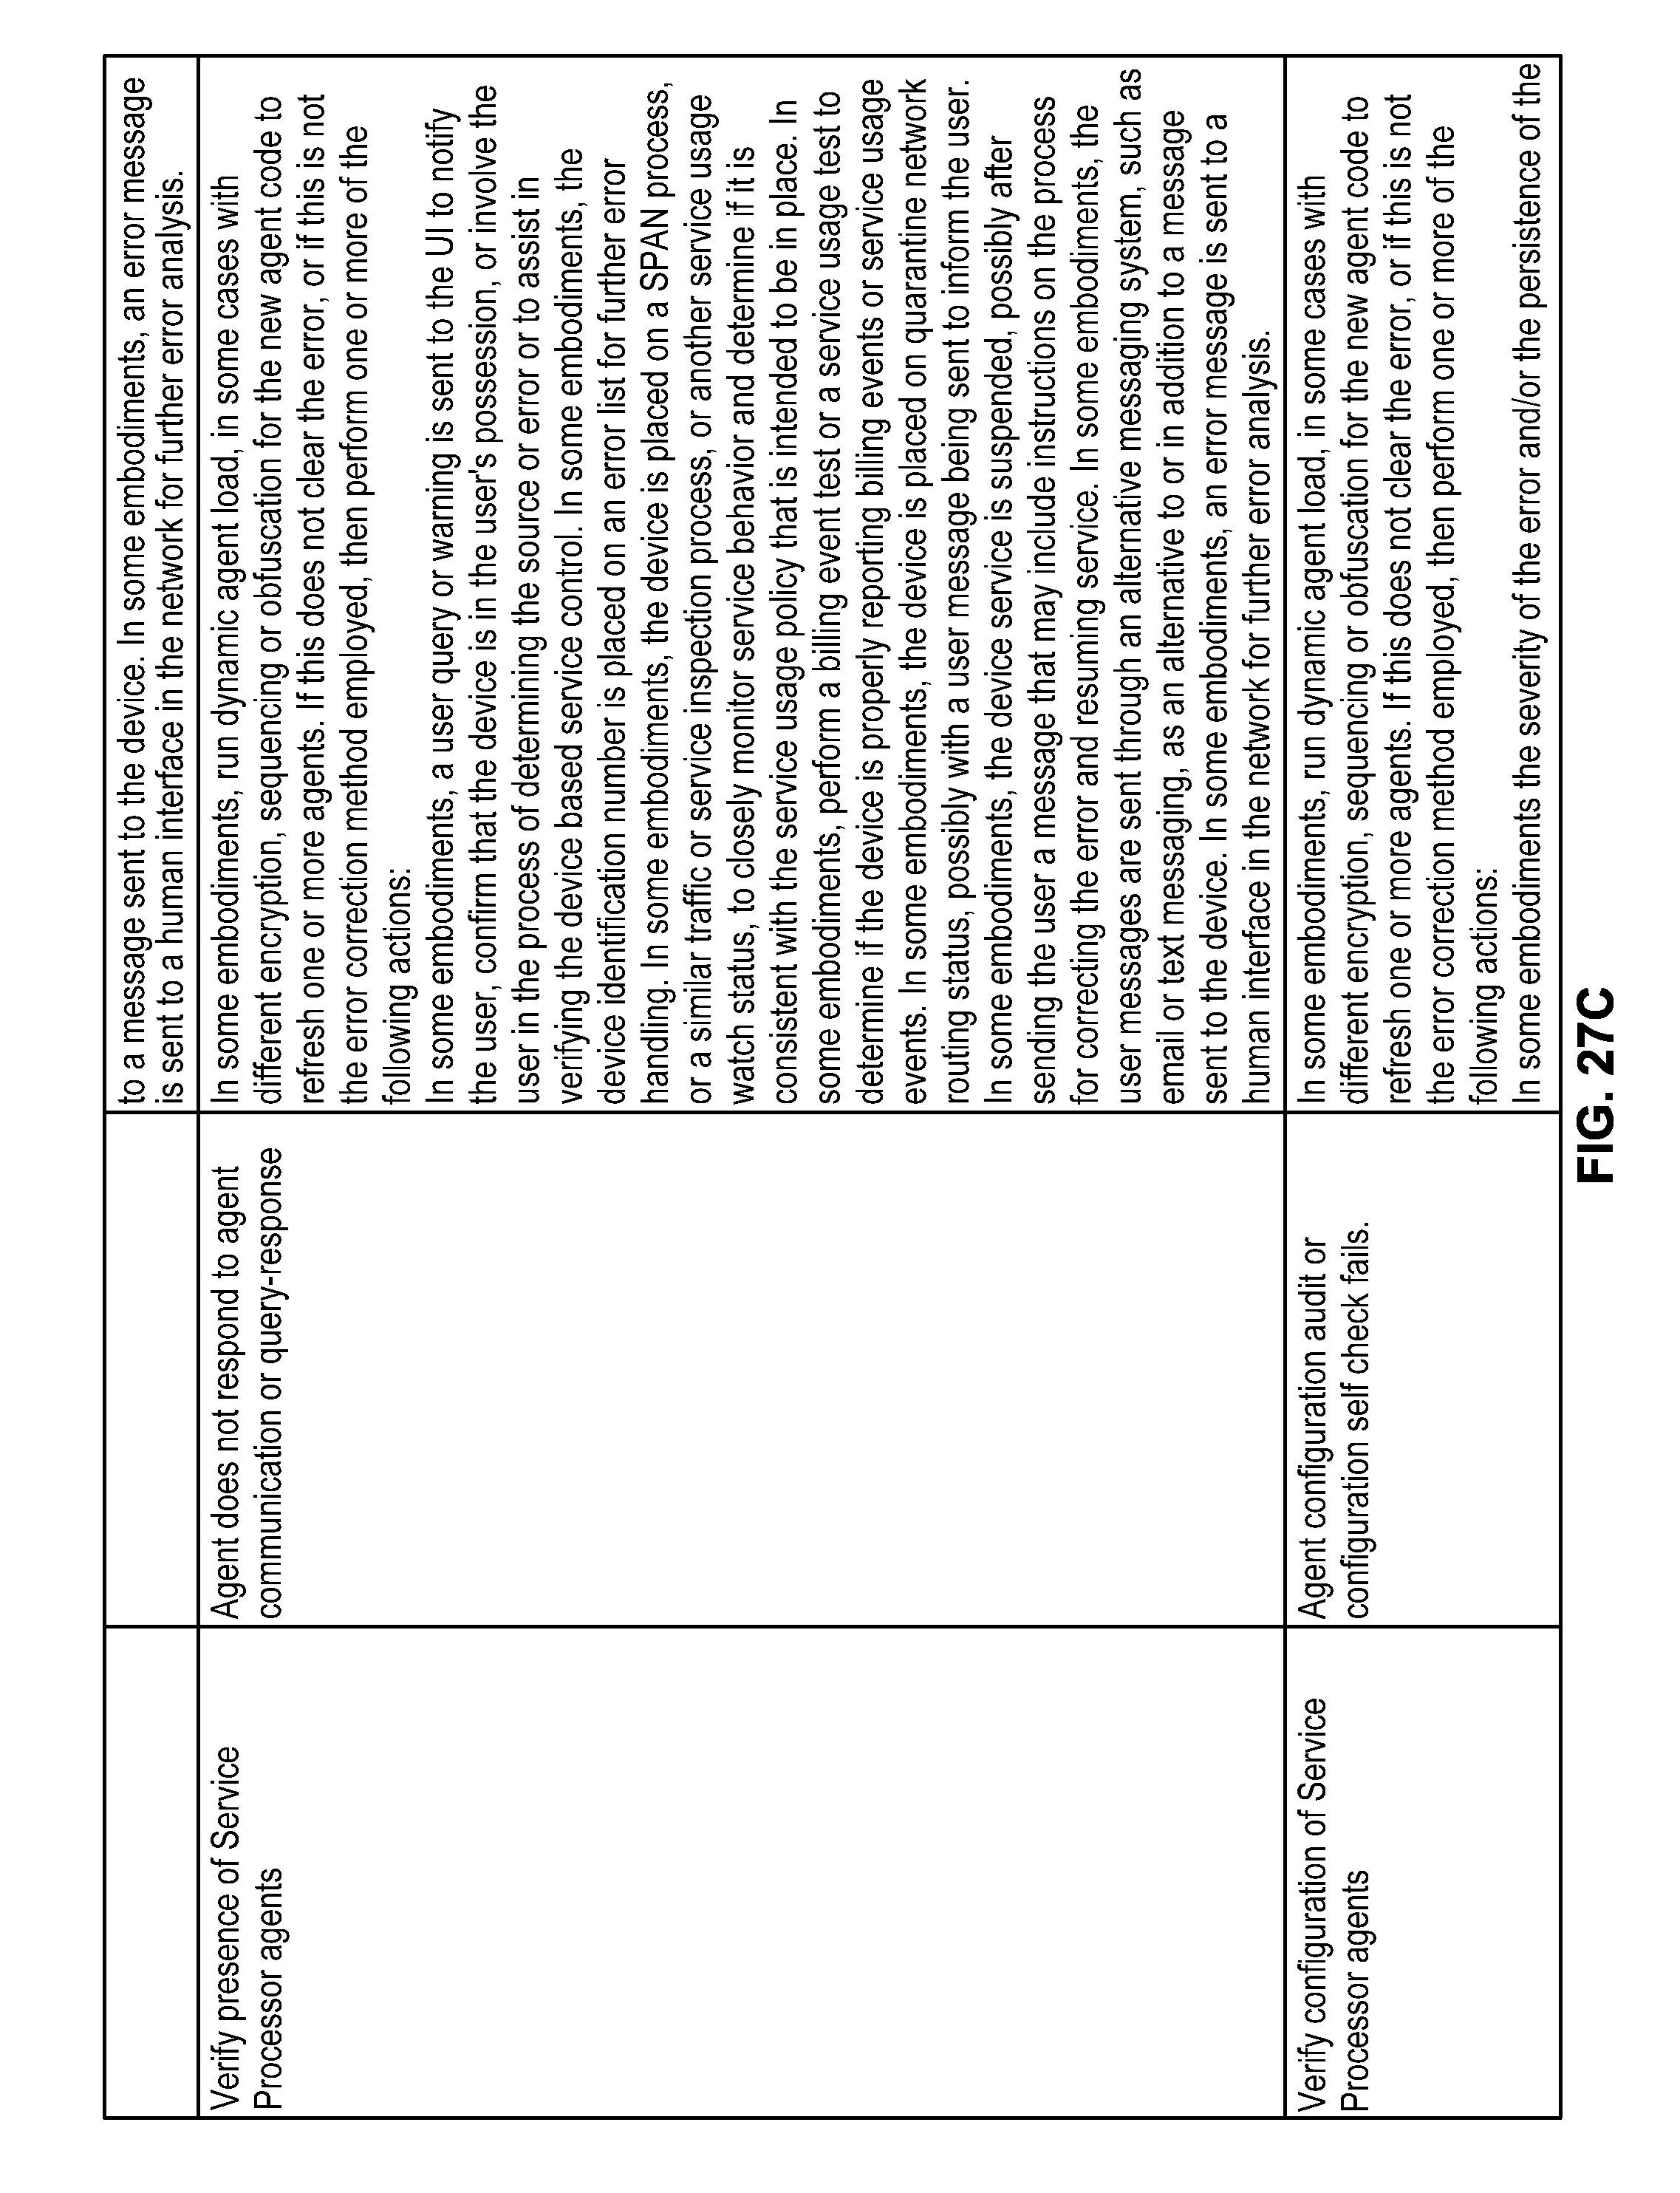 Patent US 10,064,033 B2